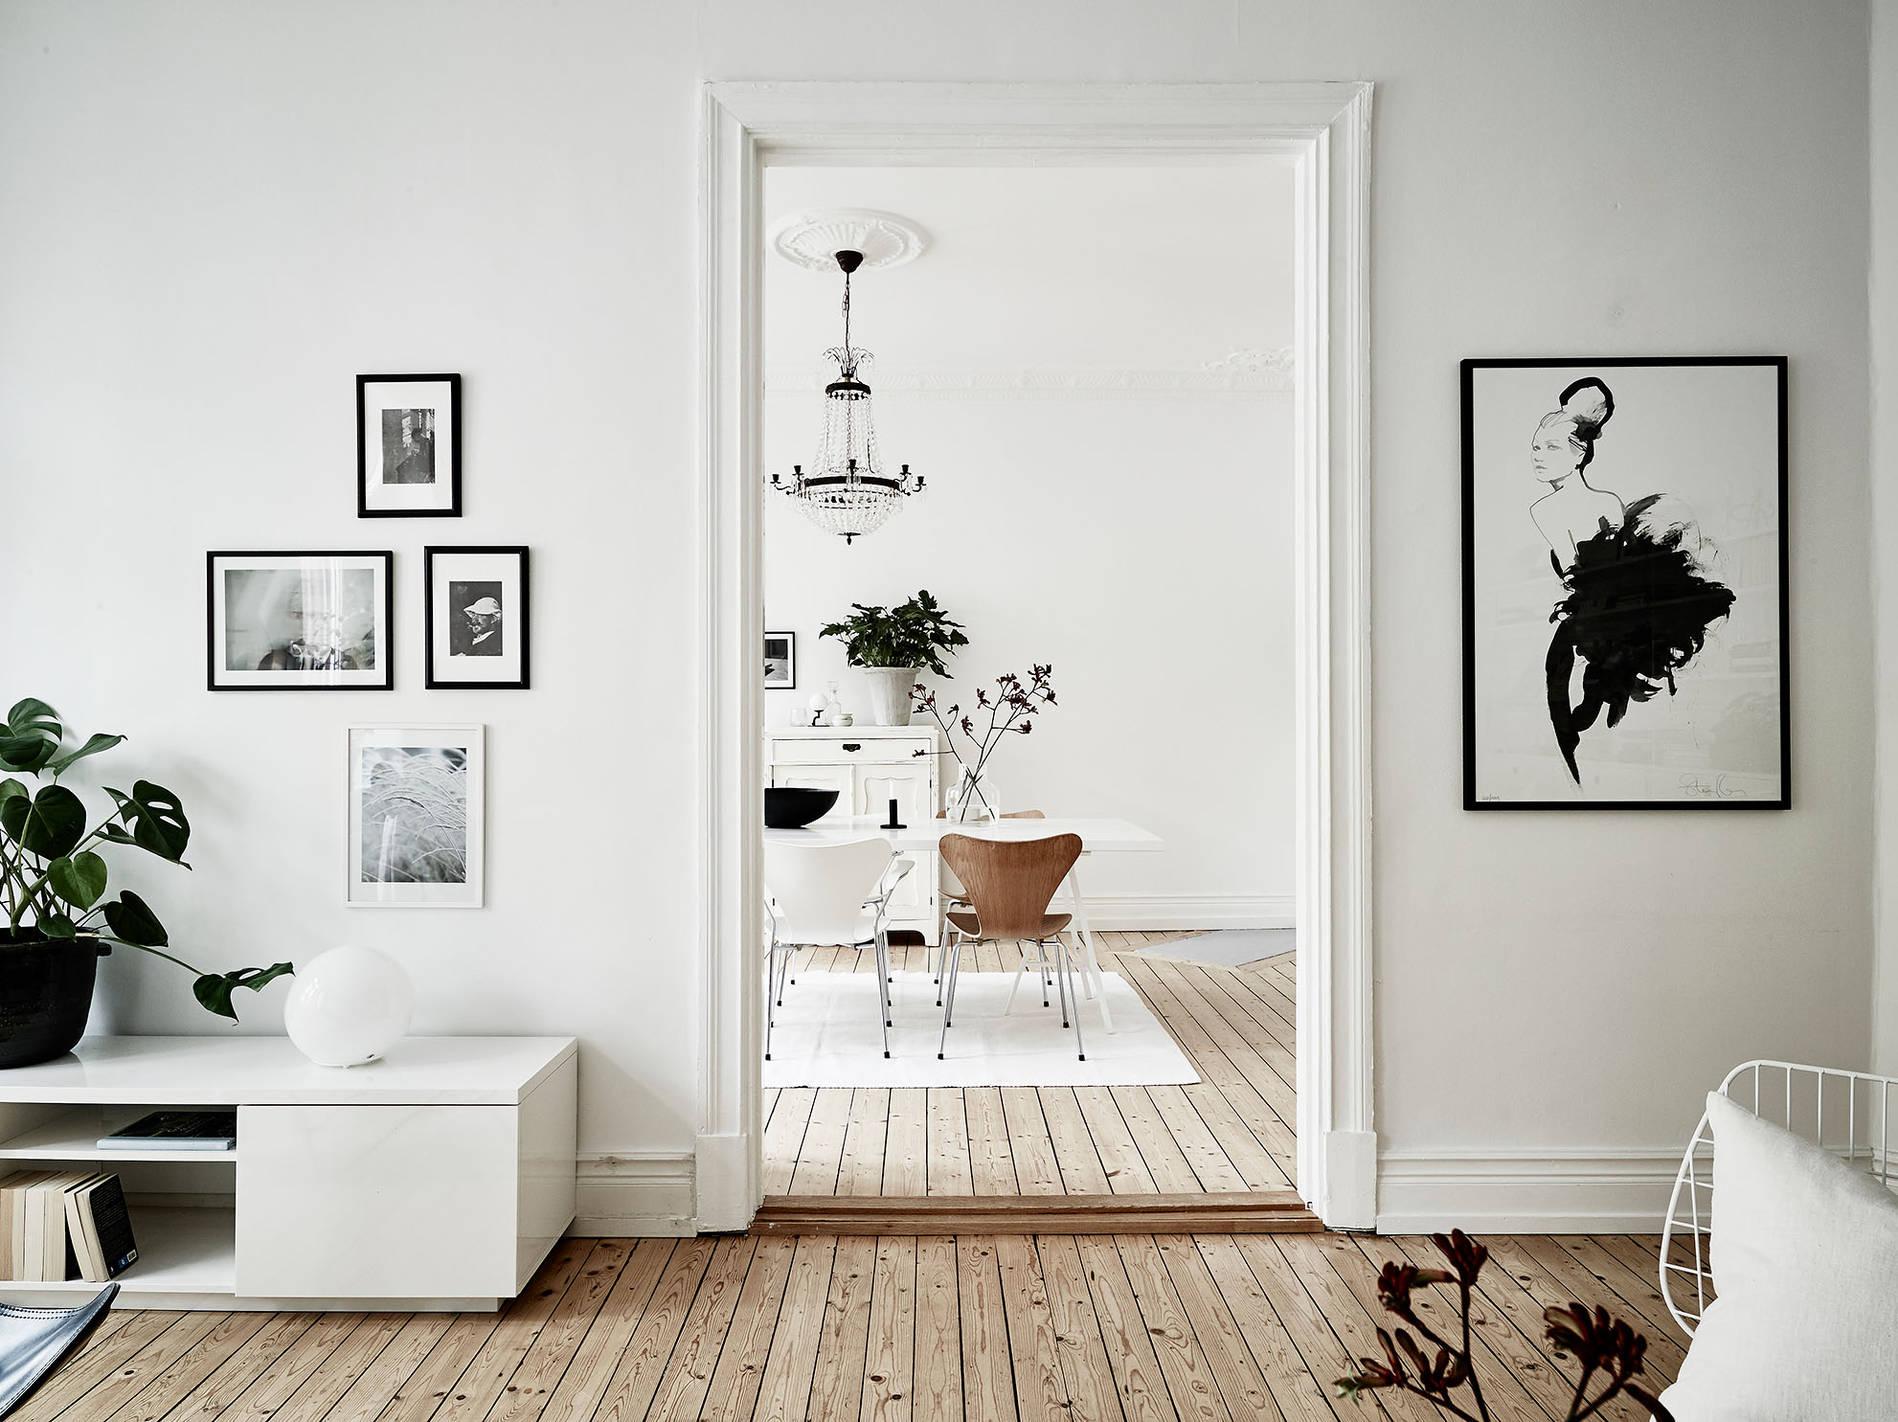 L mparas colgantes de cristal Blog tienda decoraci n estilo